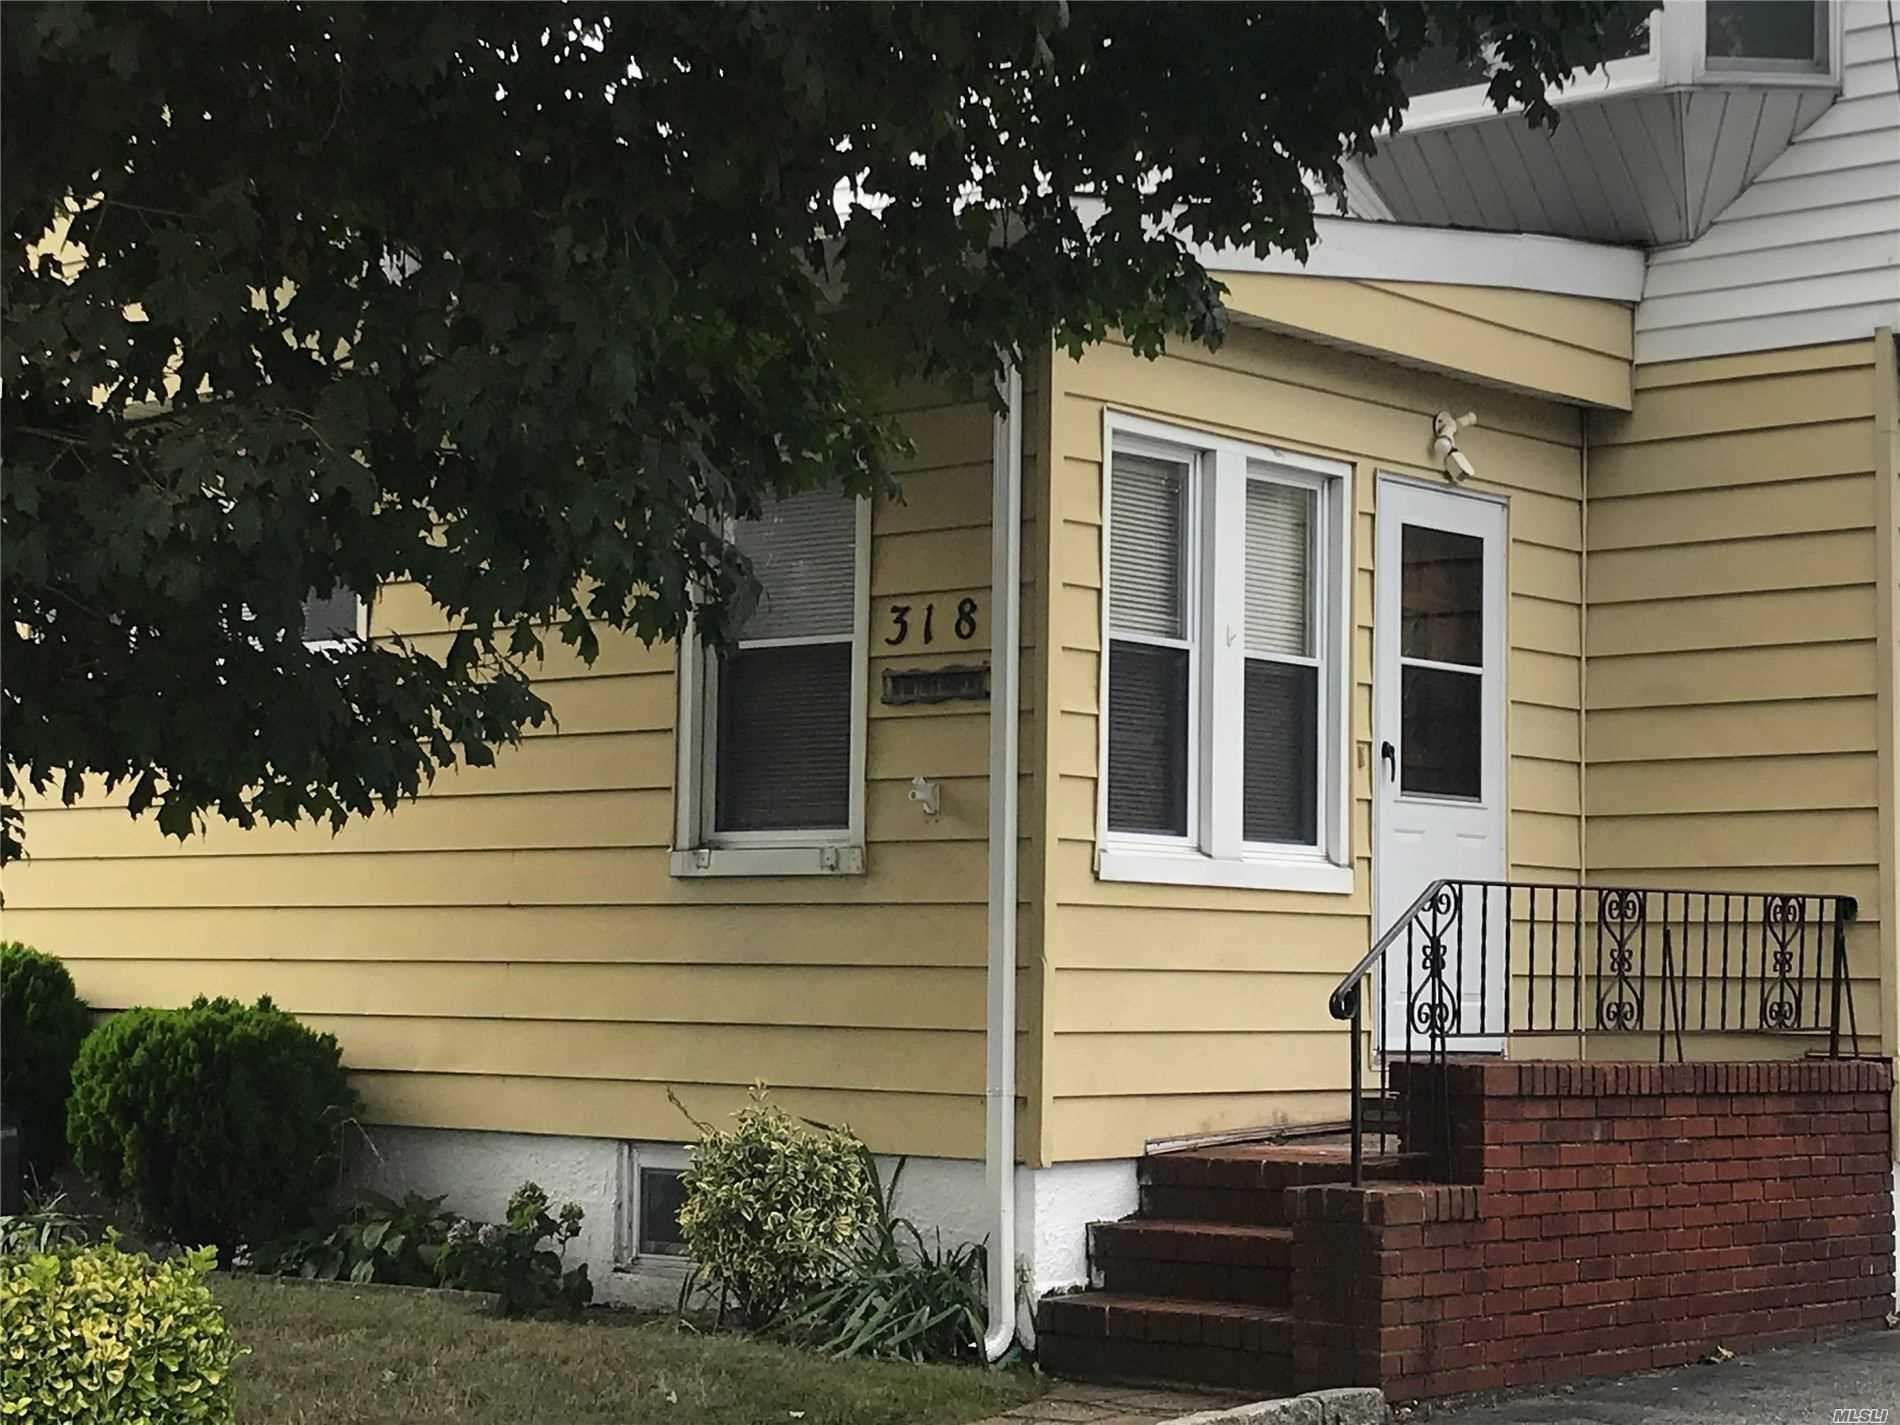 318 Frederick Avenue, Bellmore, NY 11710 - MLS#: 3242047